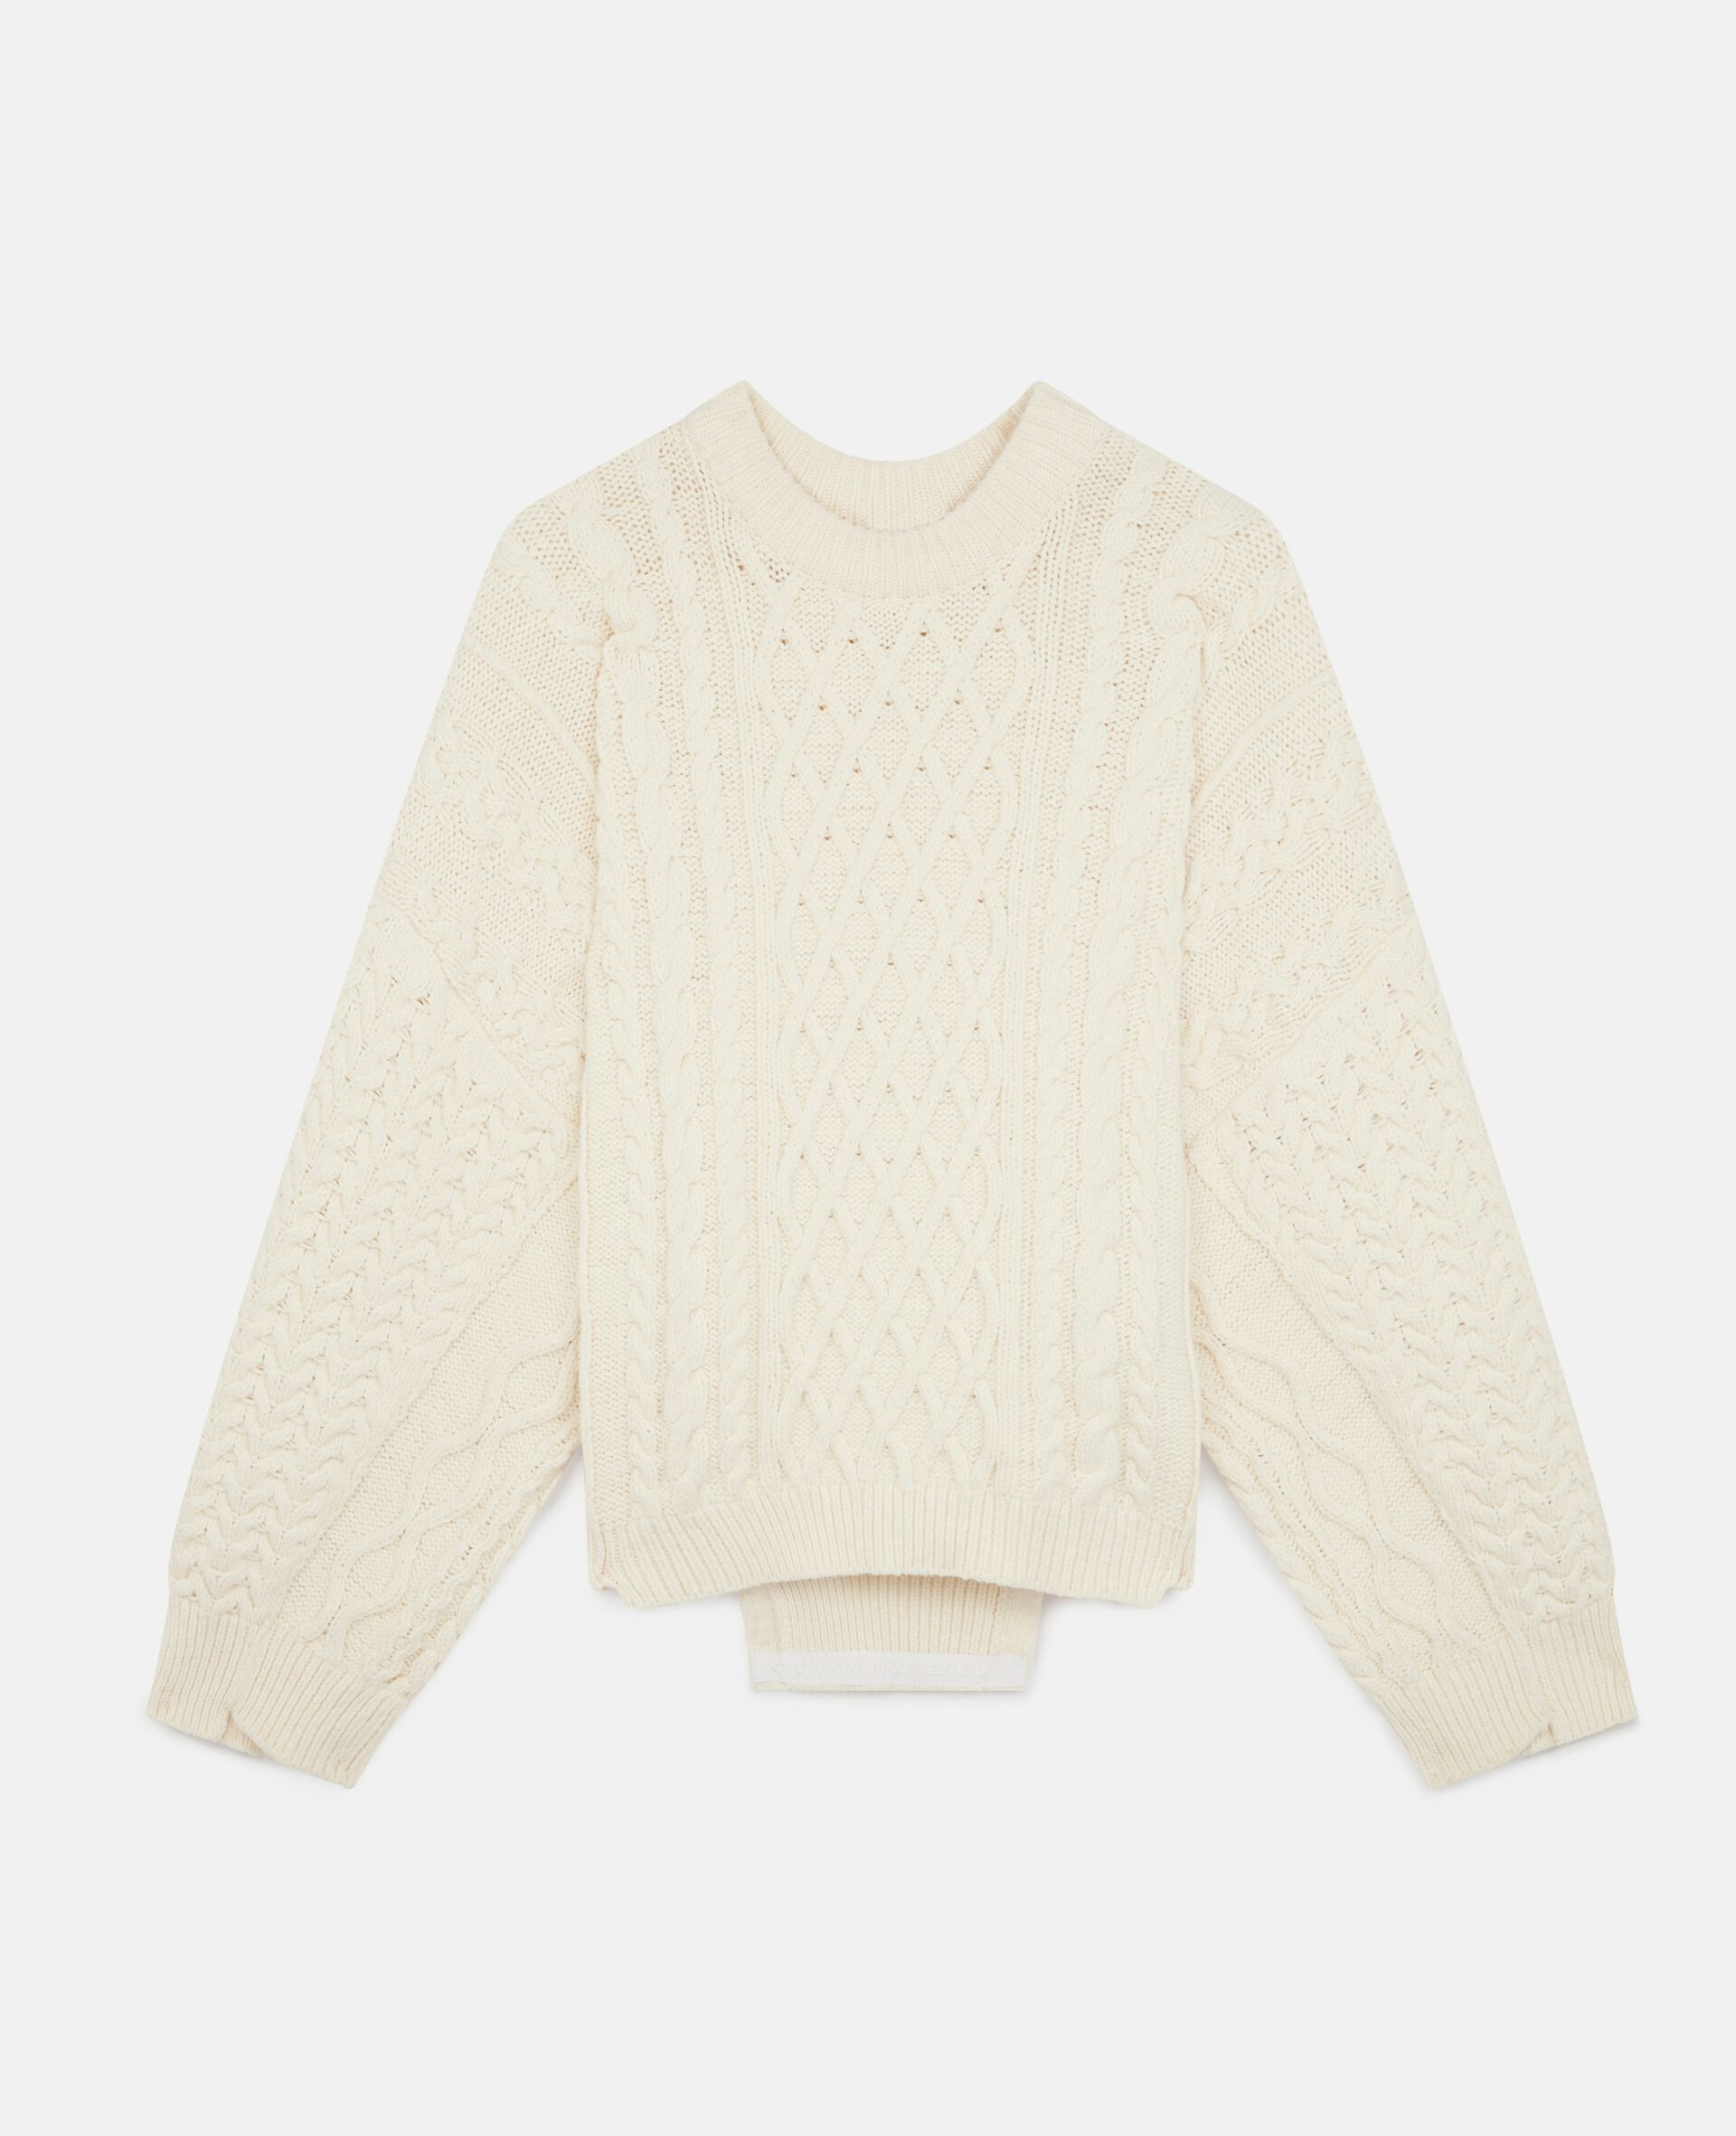 Übergroßer Pullover mit Aran-Muster-Weiß-large image number 0